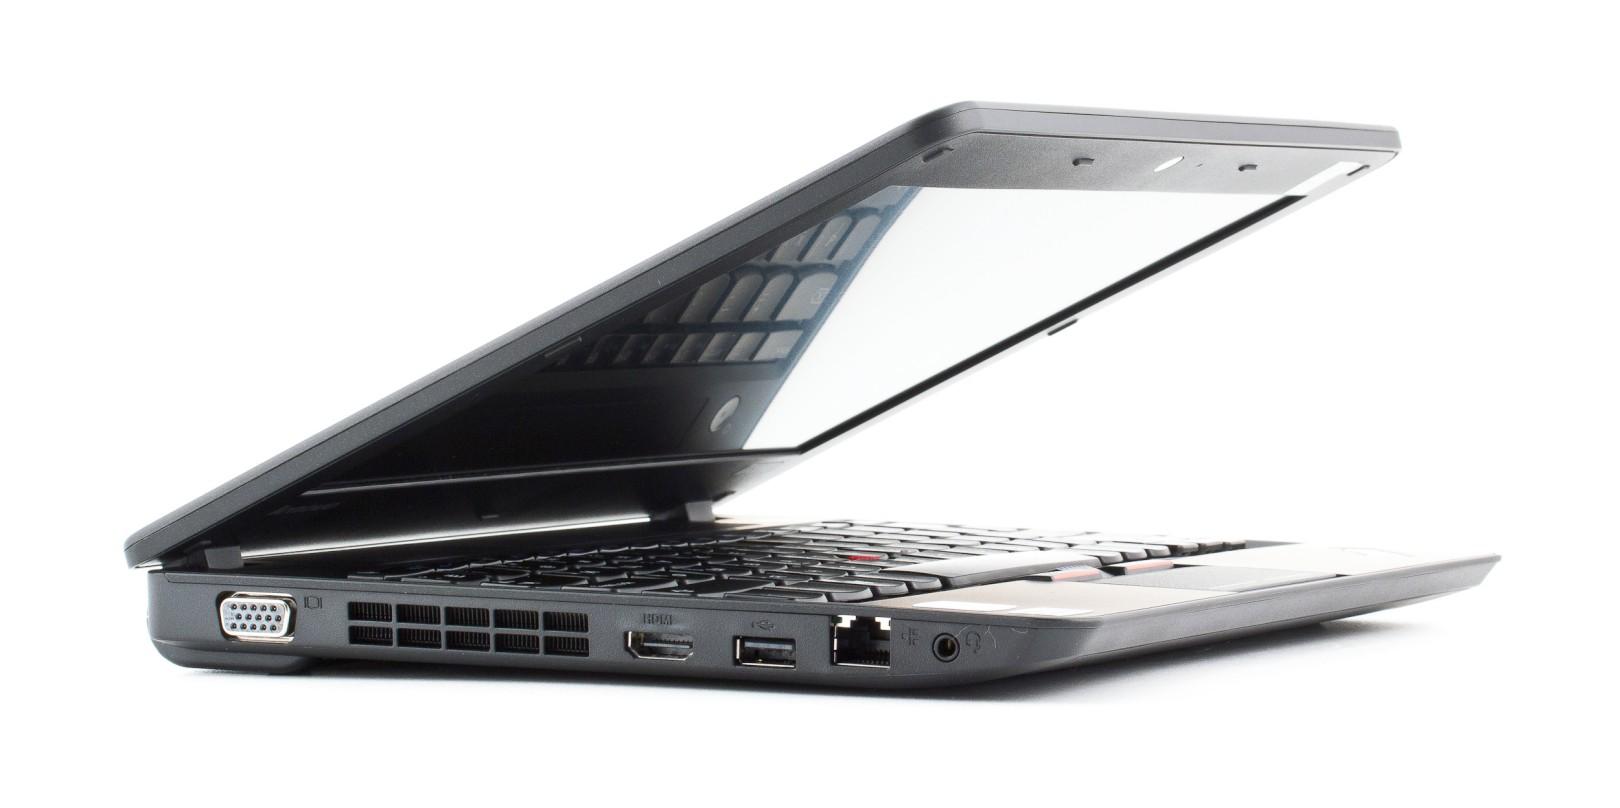 Lenovo ThinkPad X121e Ericsson WWAN Driver for Windows 7